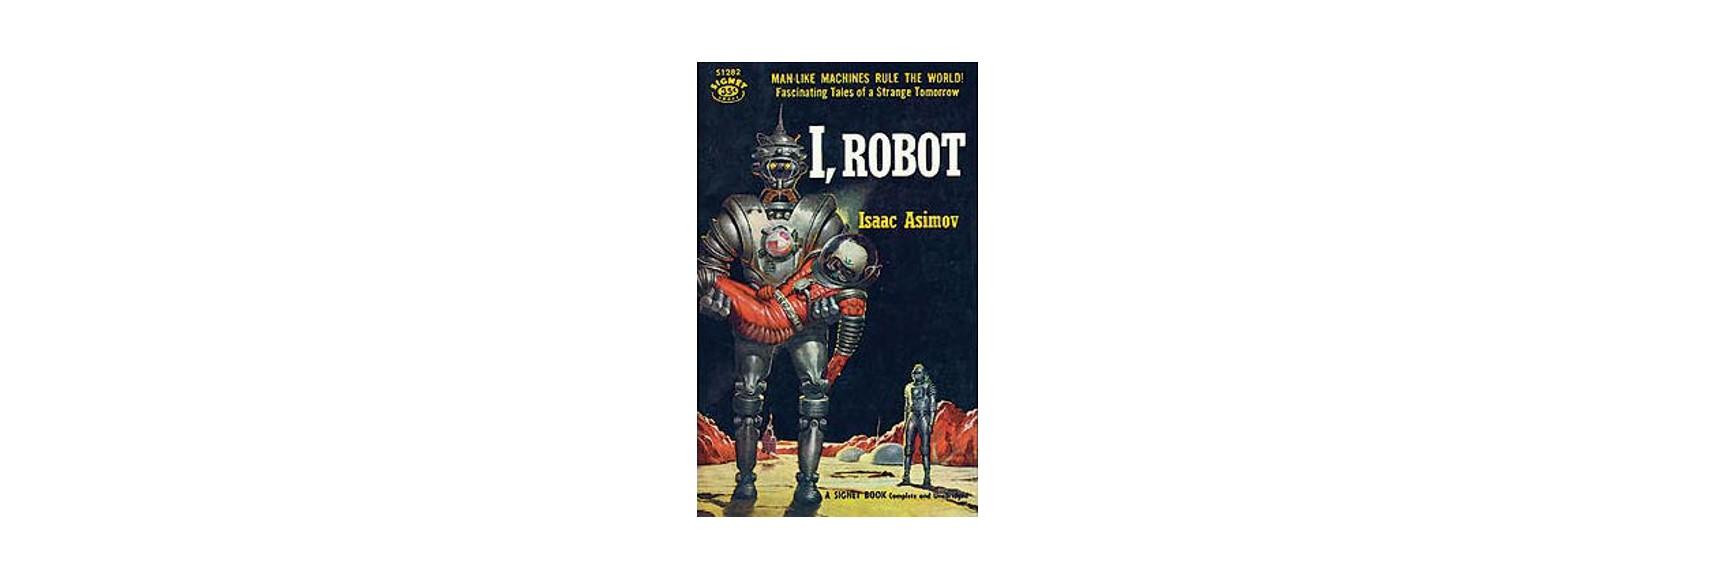 Why modern 4x4s break the laws of robotics